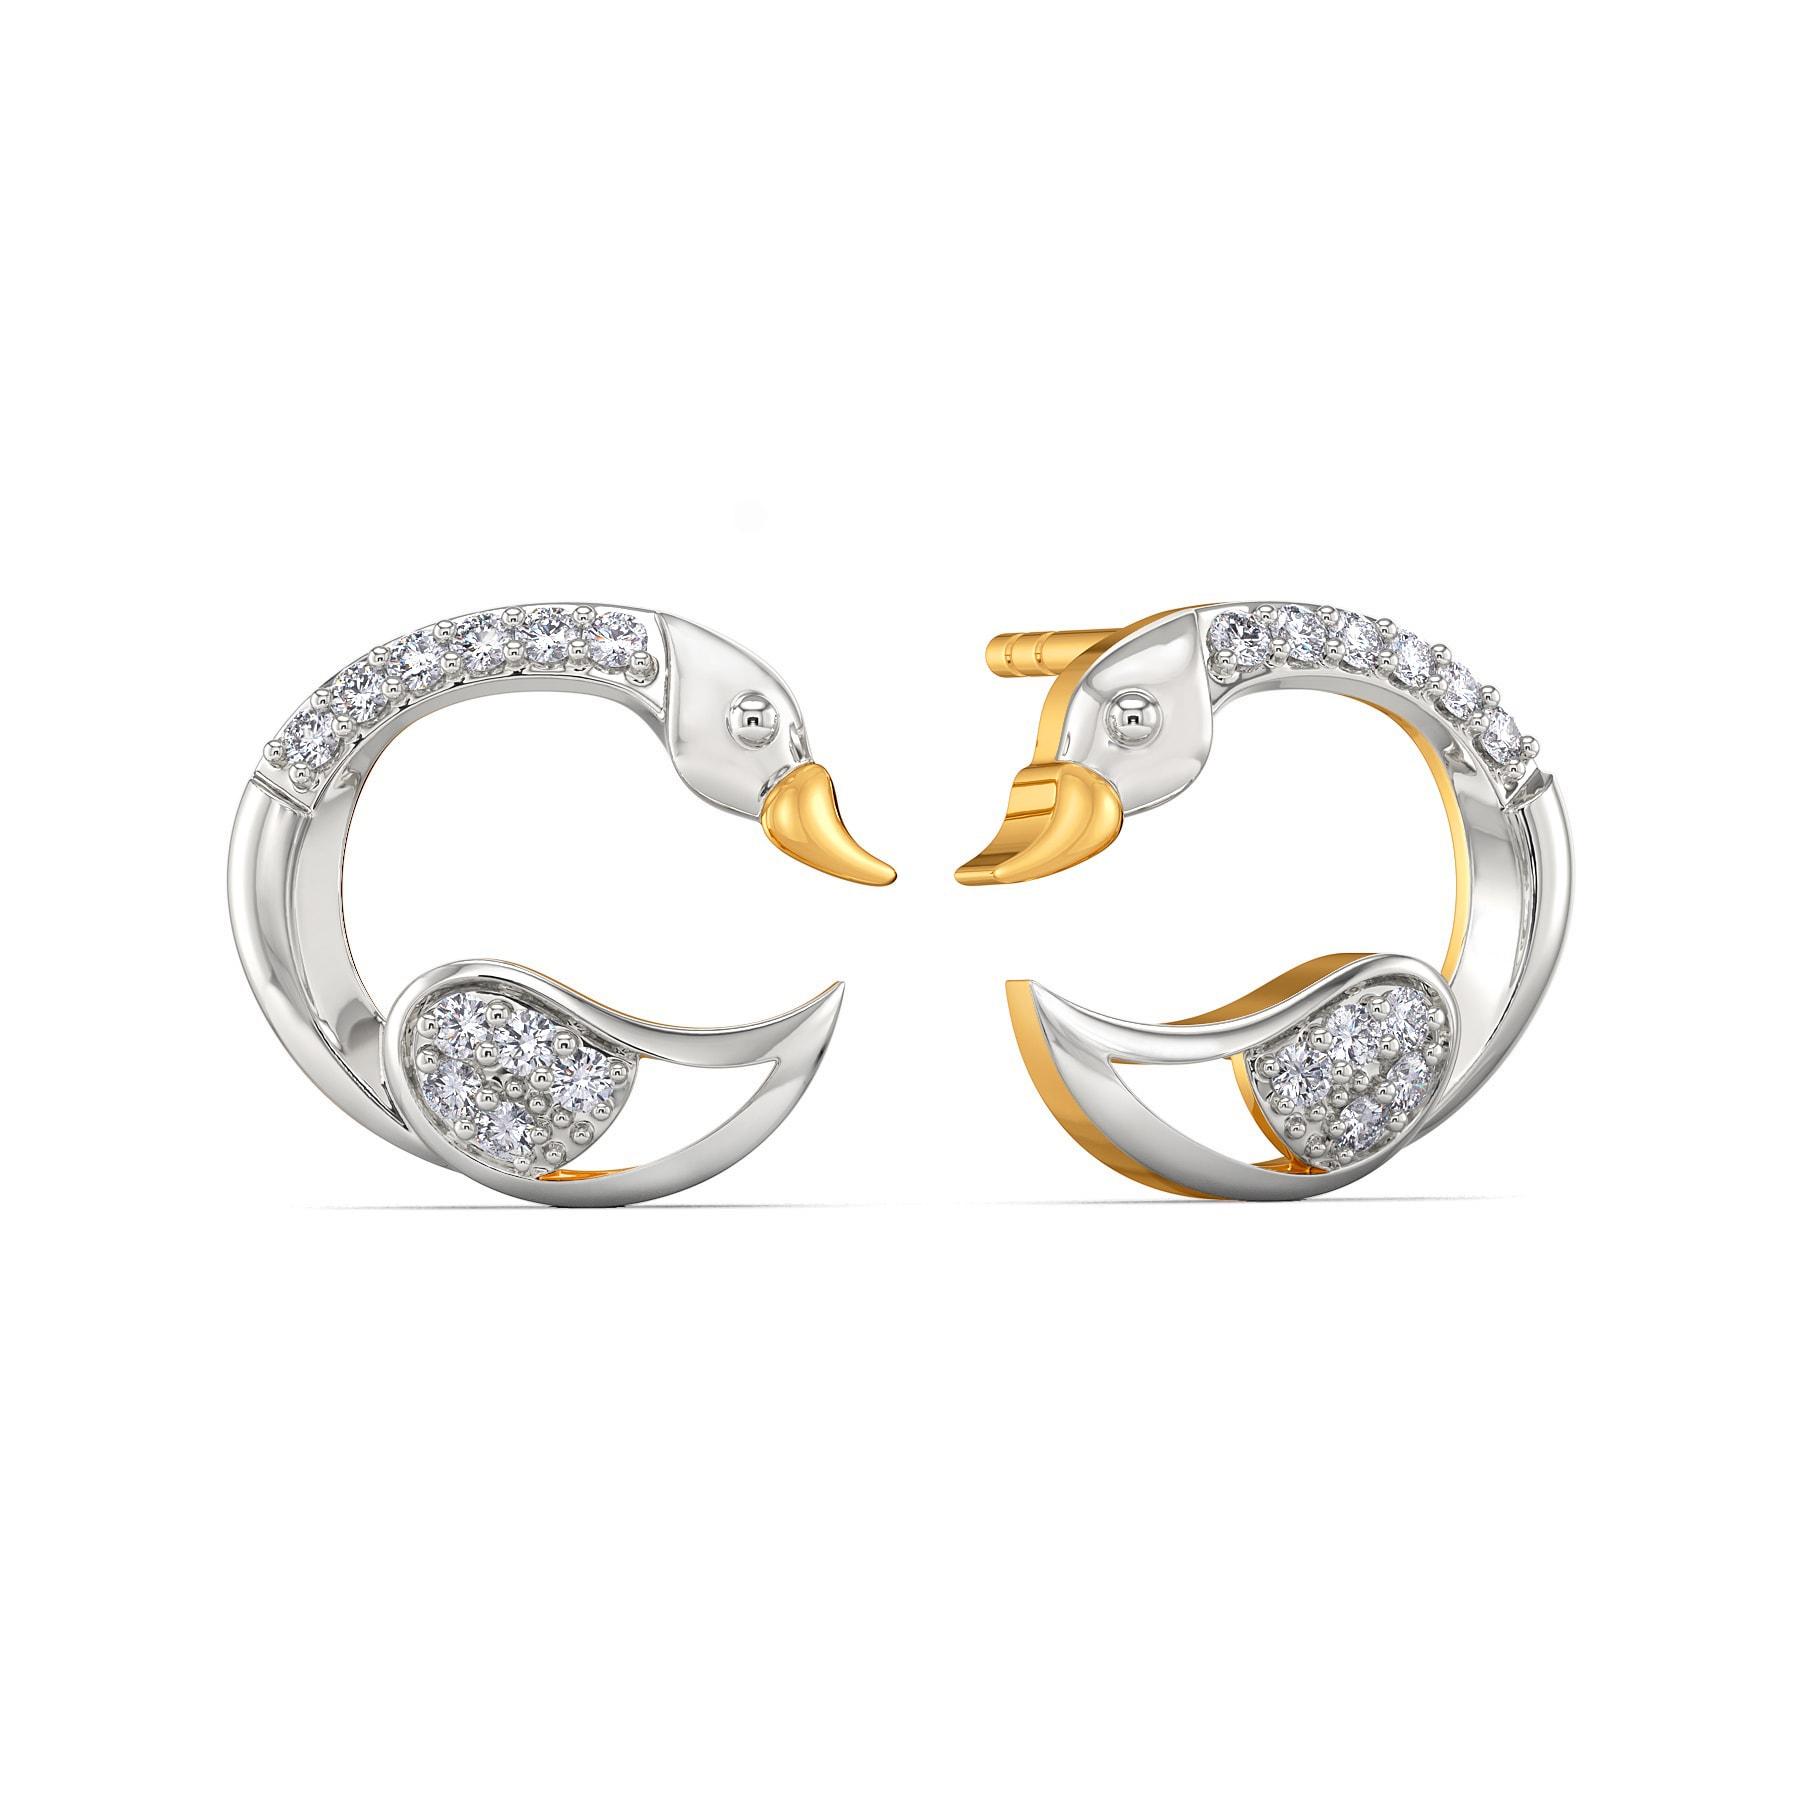 Swan Suave Diamond Earrings